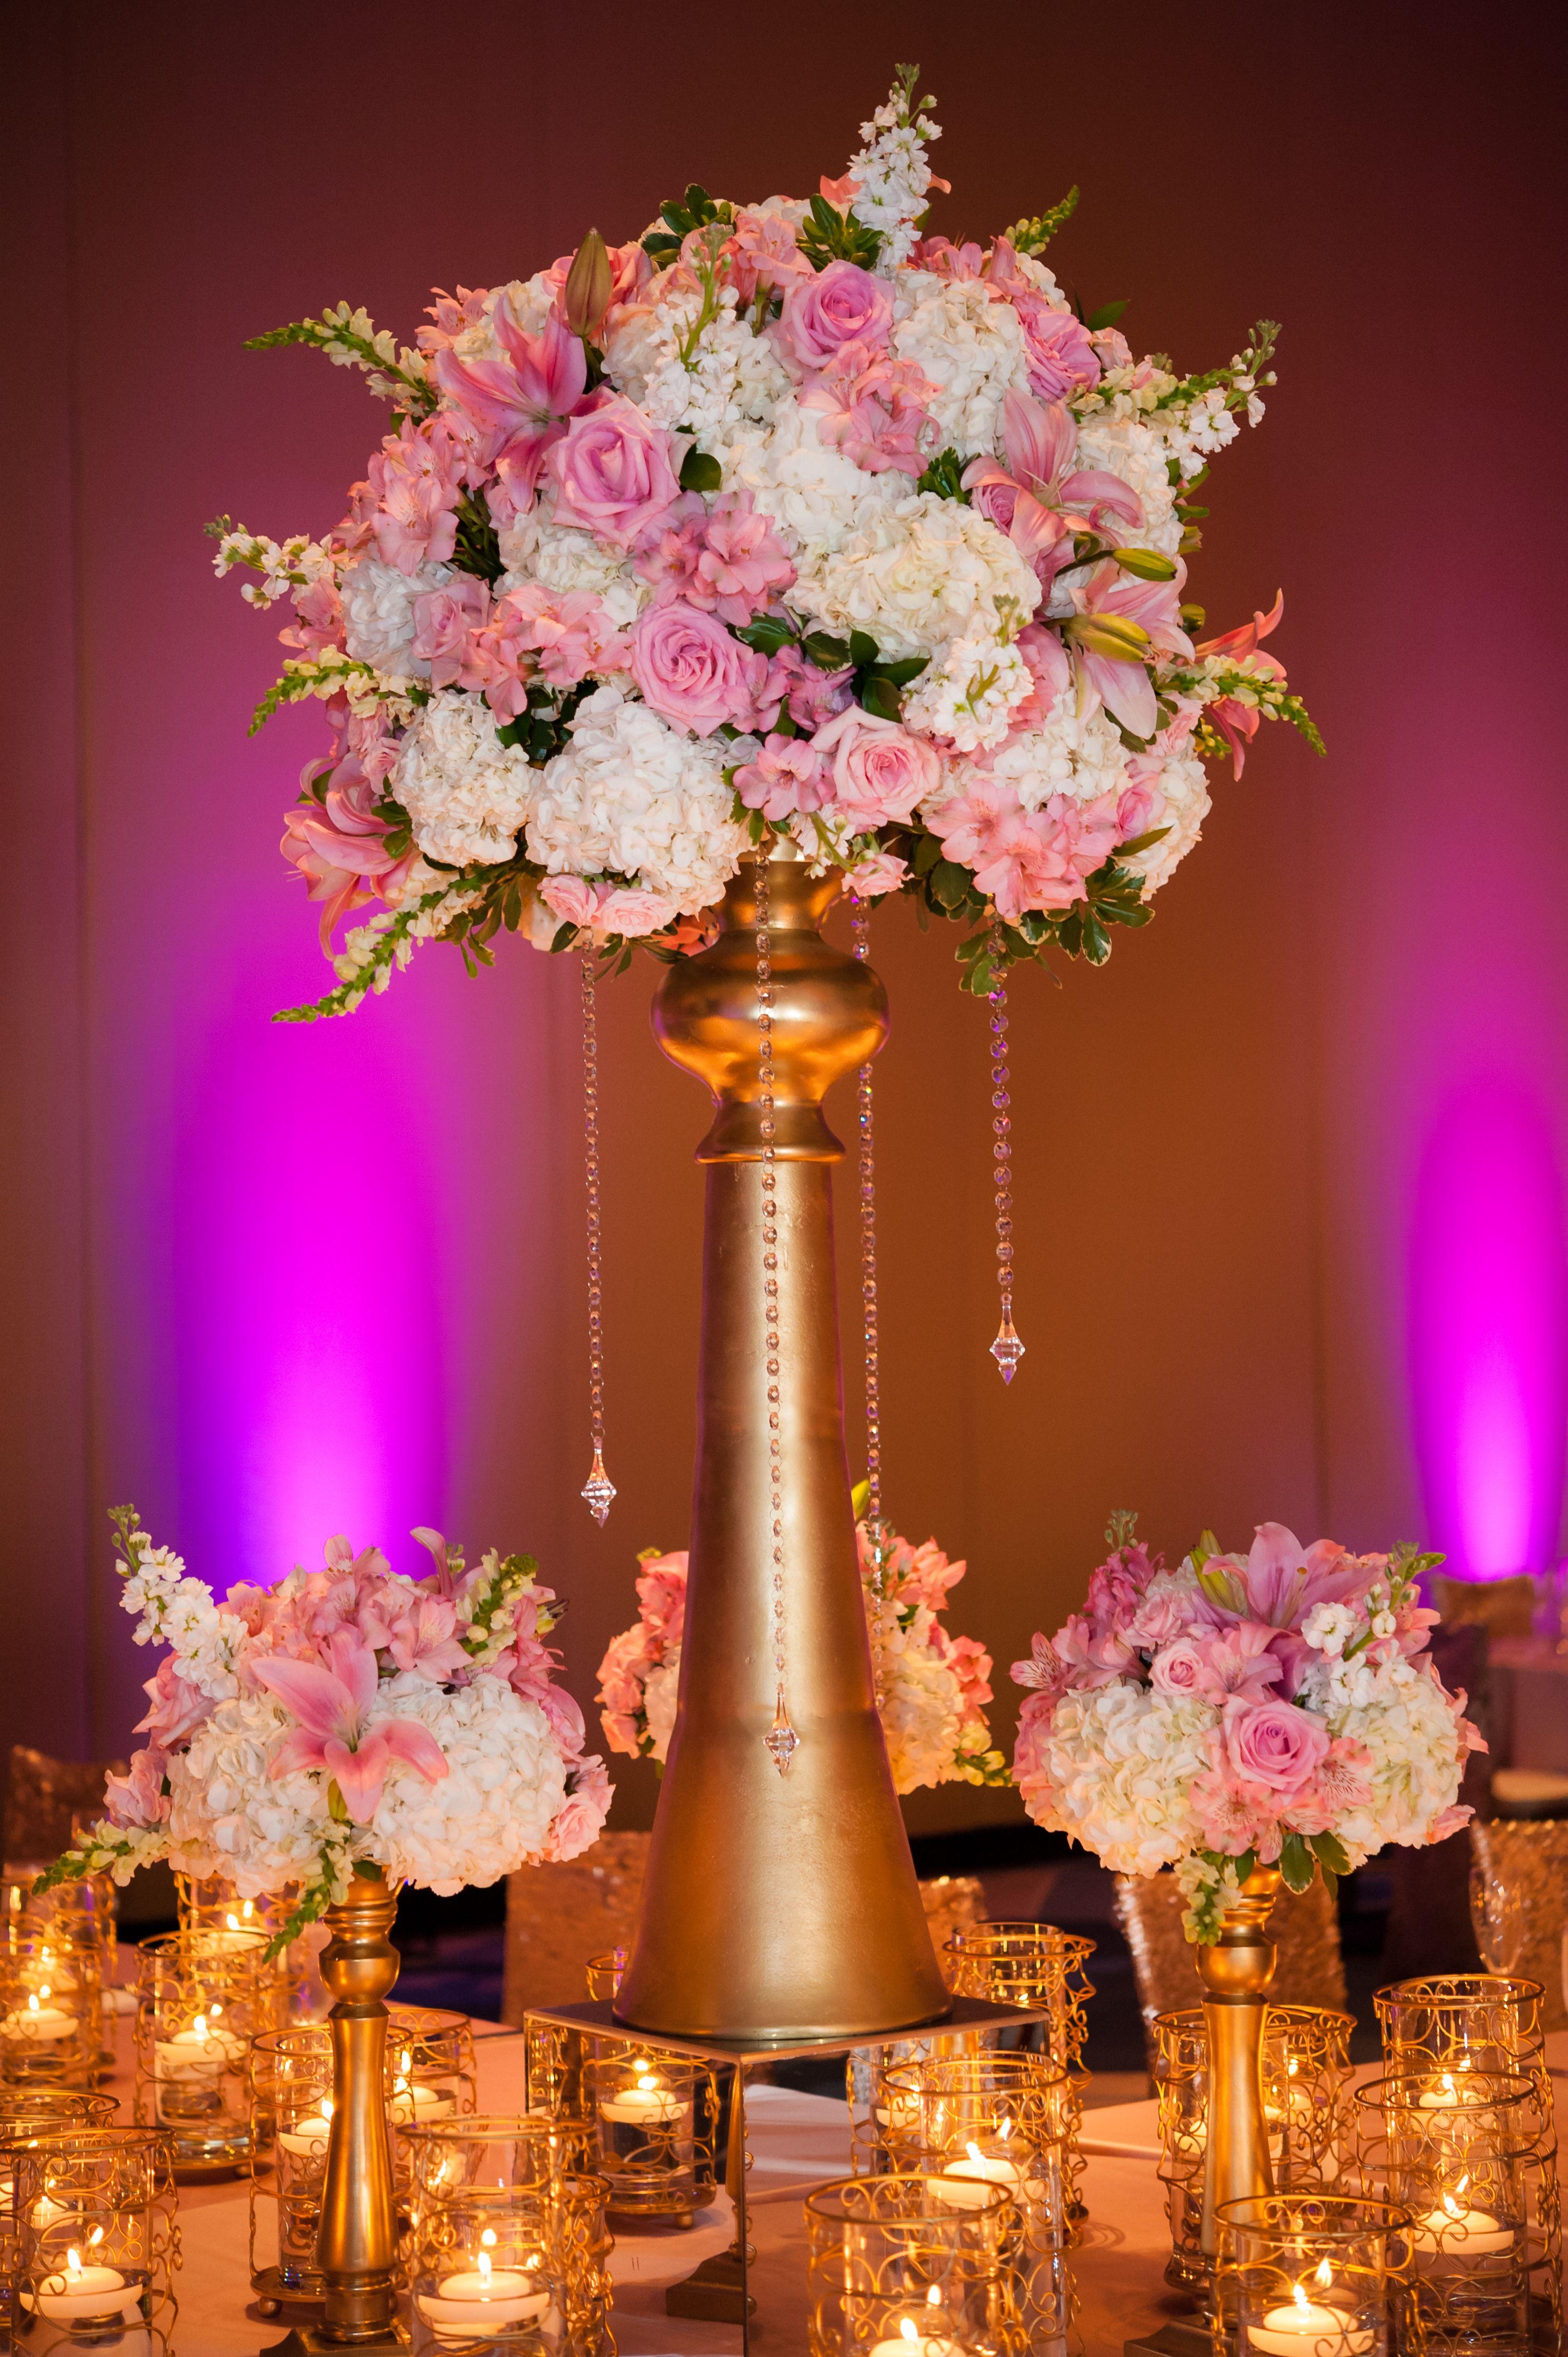 Reception Decor Centerpiece Flower Centerpiece Pink And